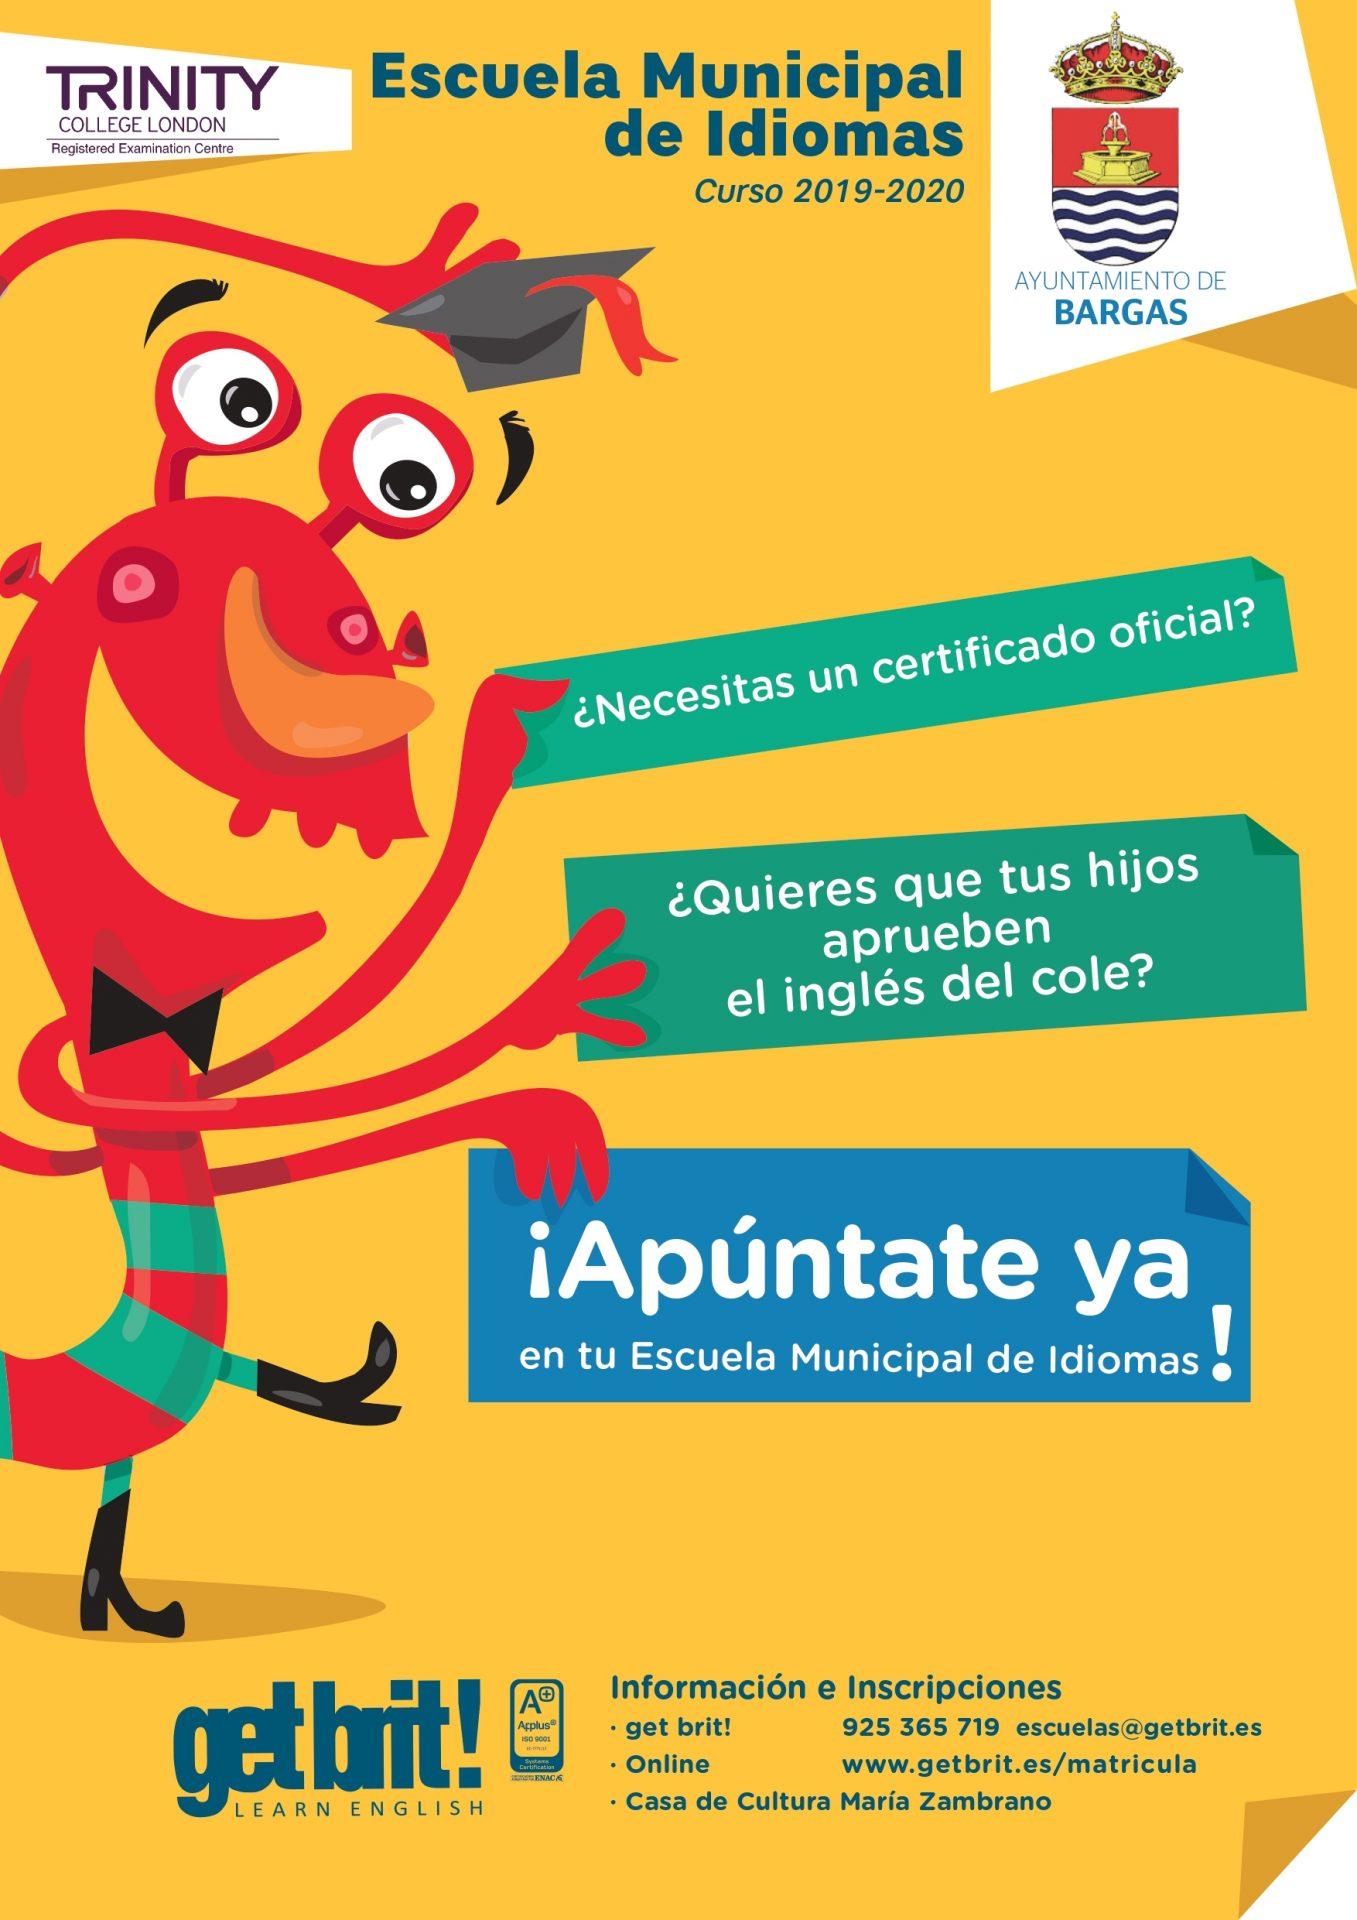 Escuela de Idiomas Curso 2019/2020